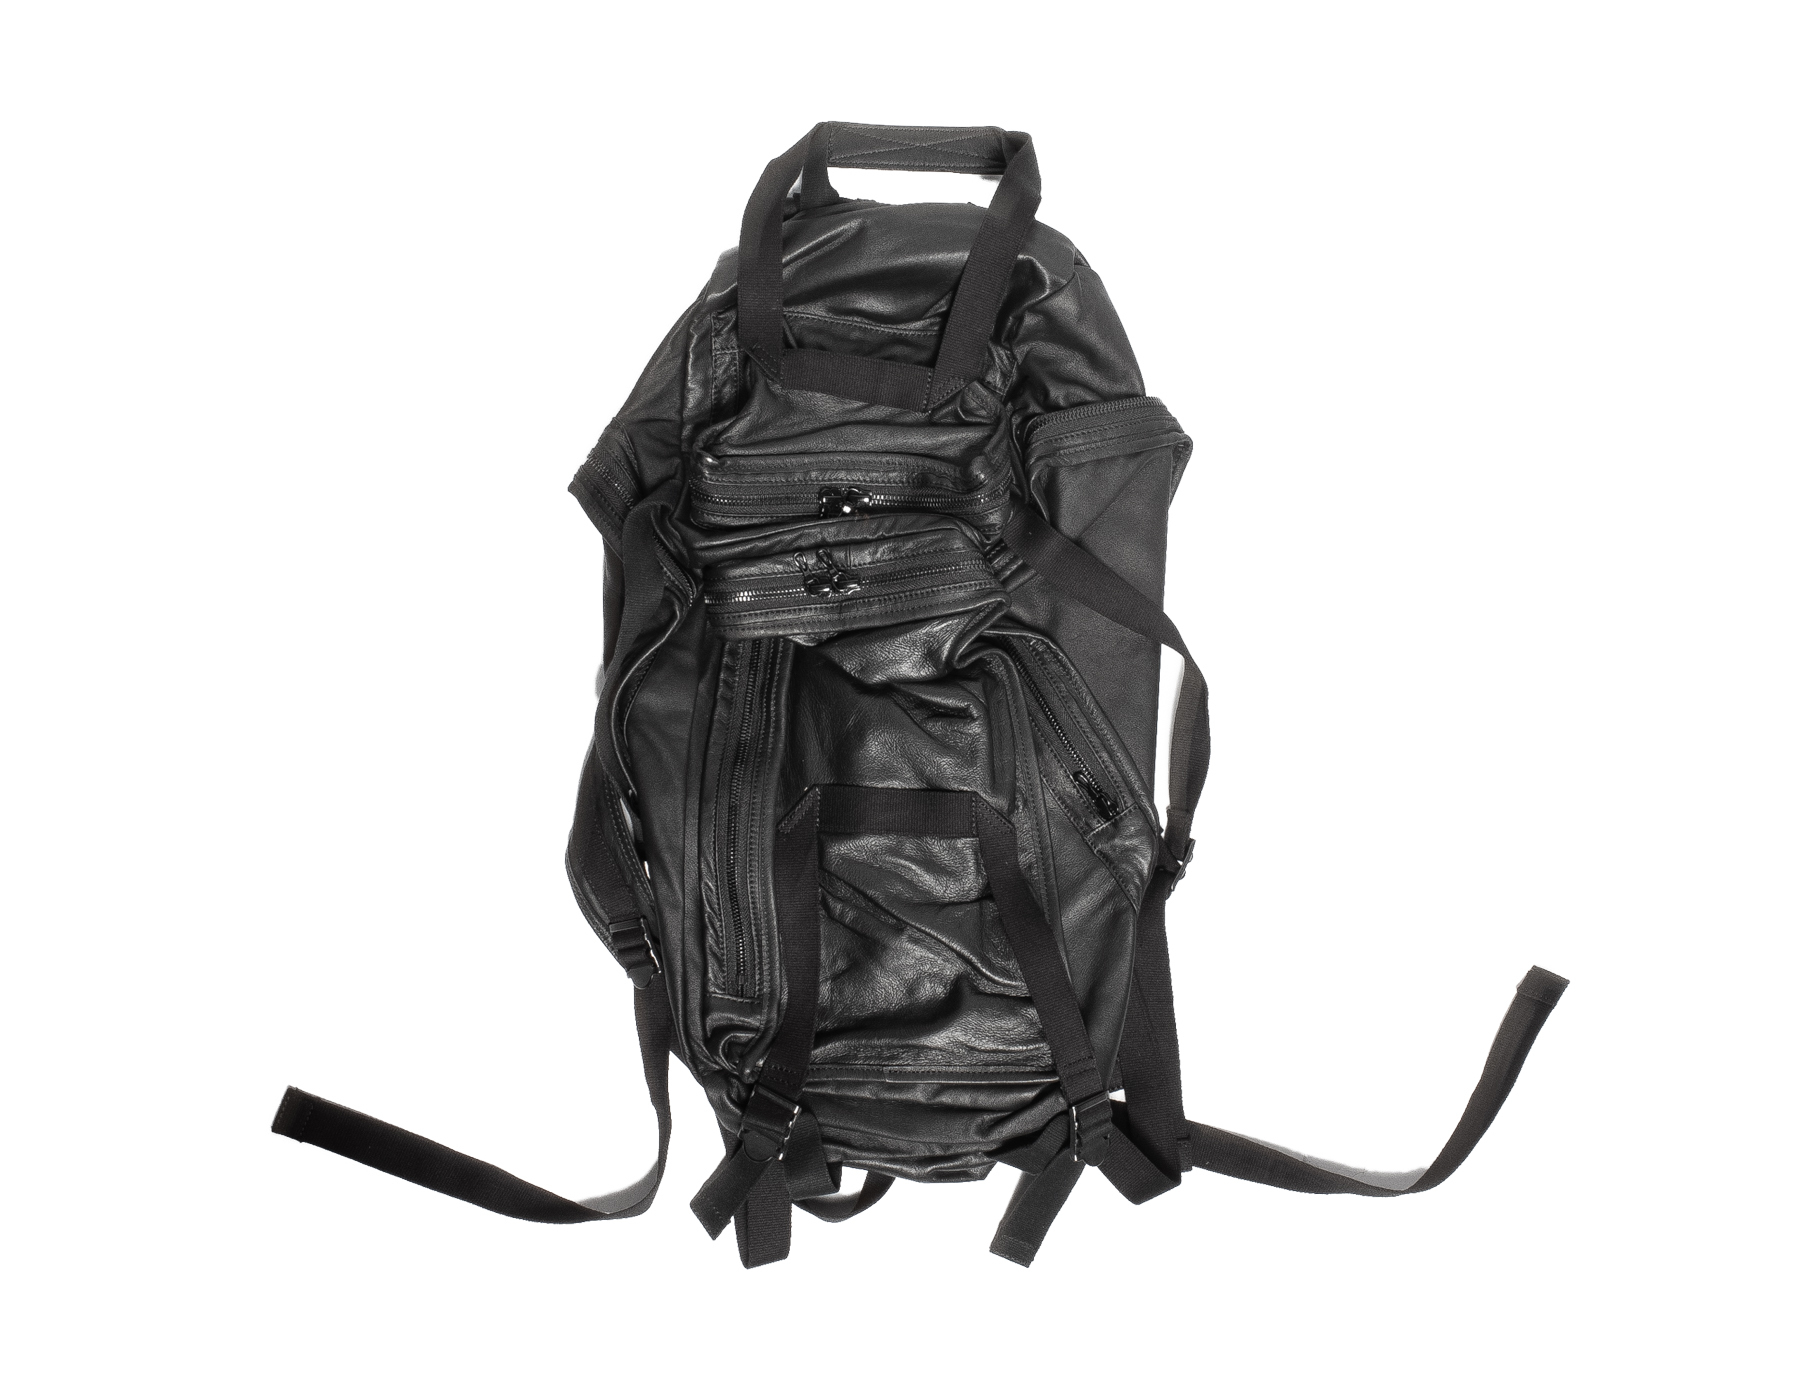 557BGU1-S-BLACK / インバーテッドミリタリーバックパック